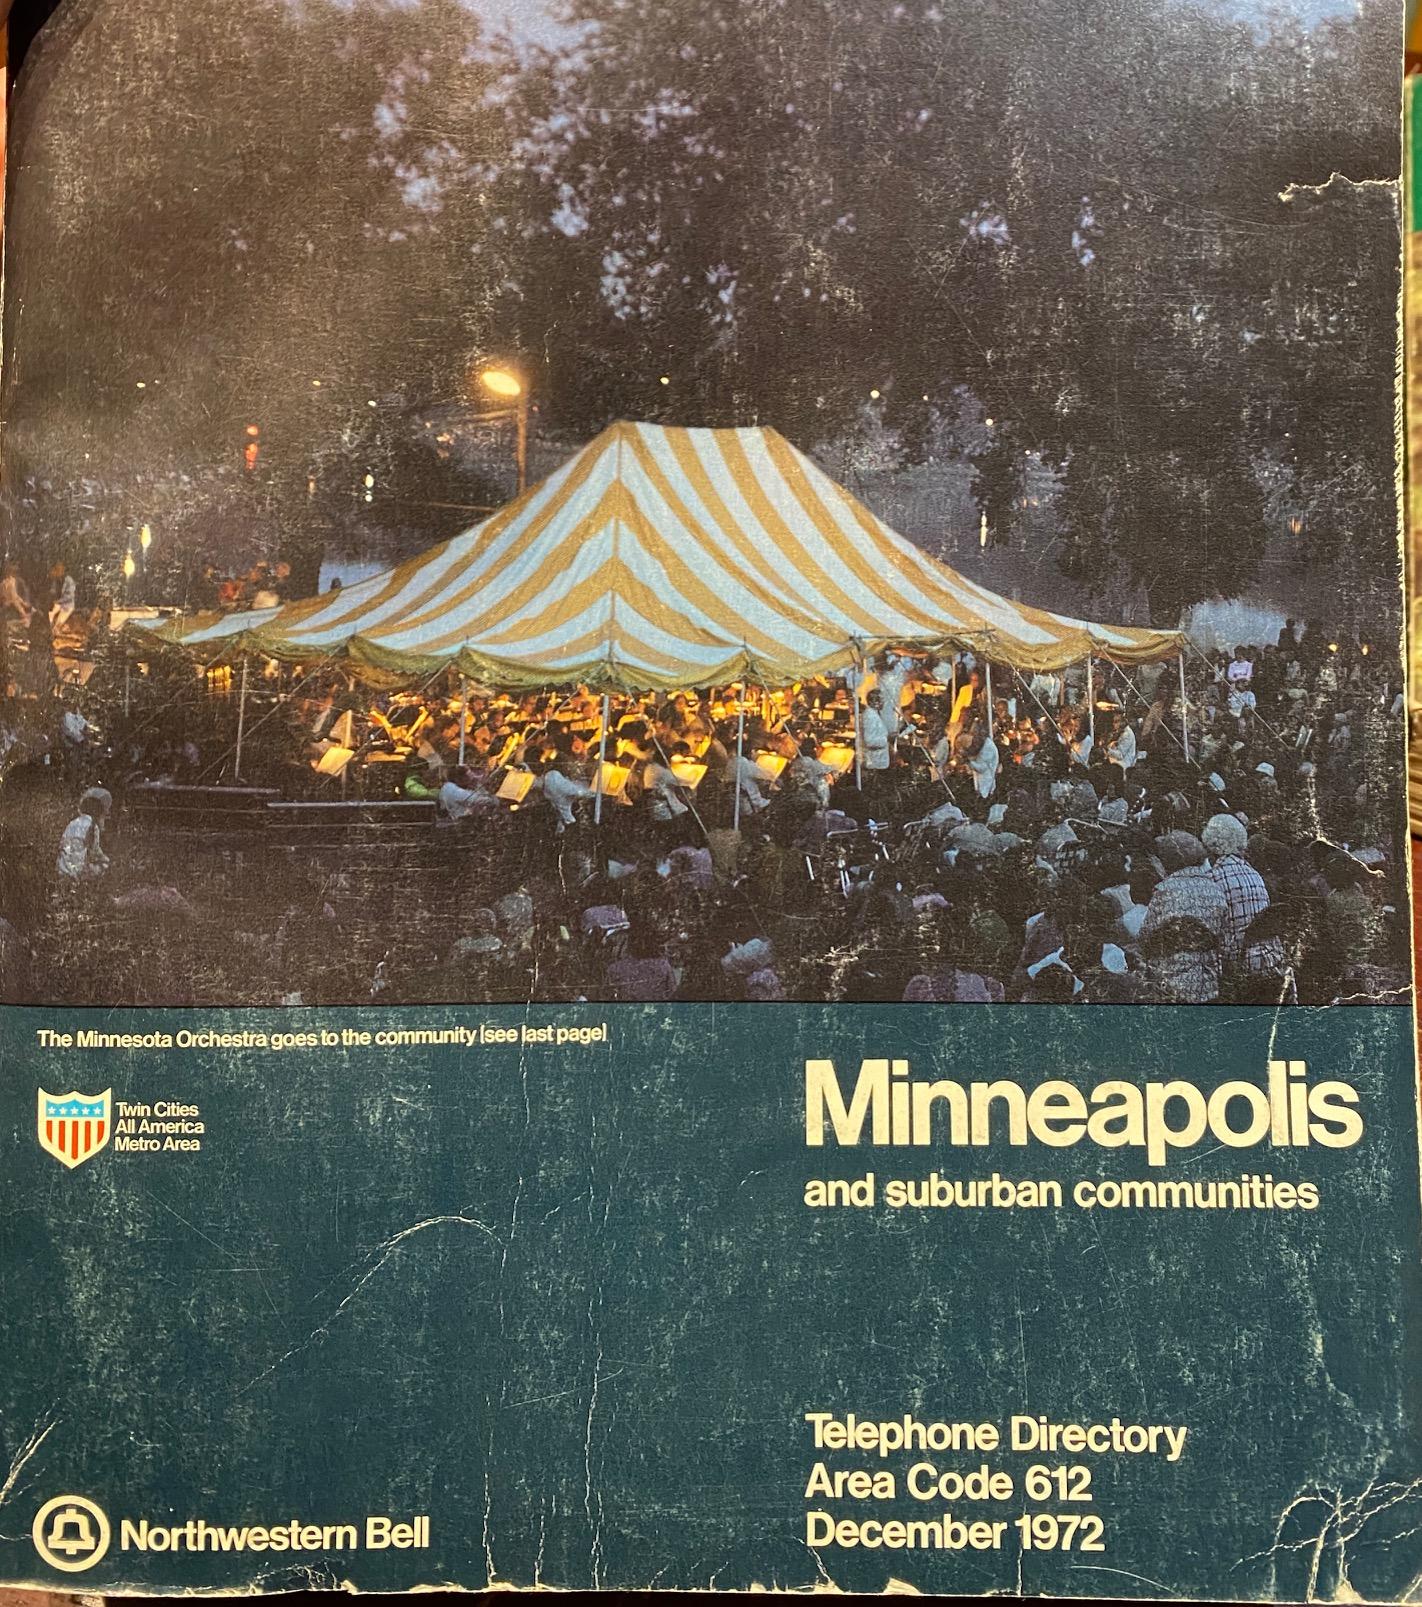 cover 1972 Minneapolis phone book.